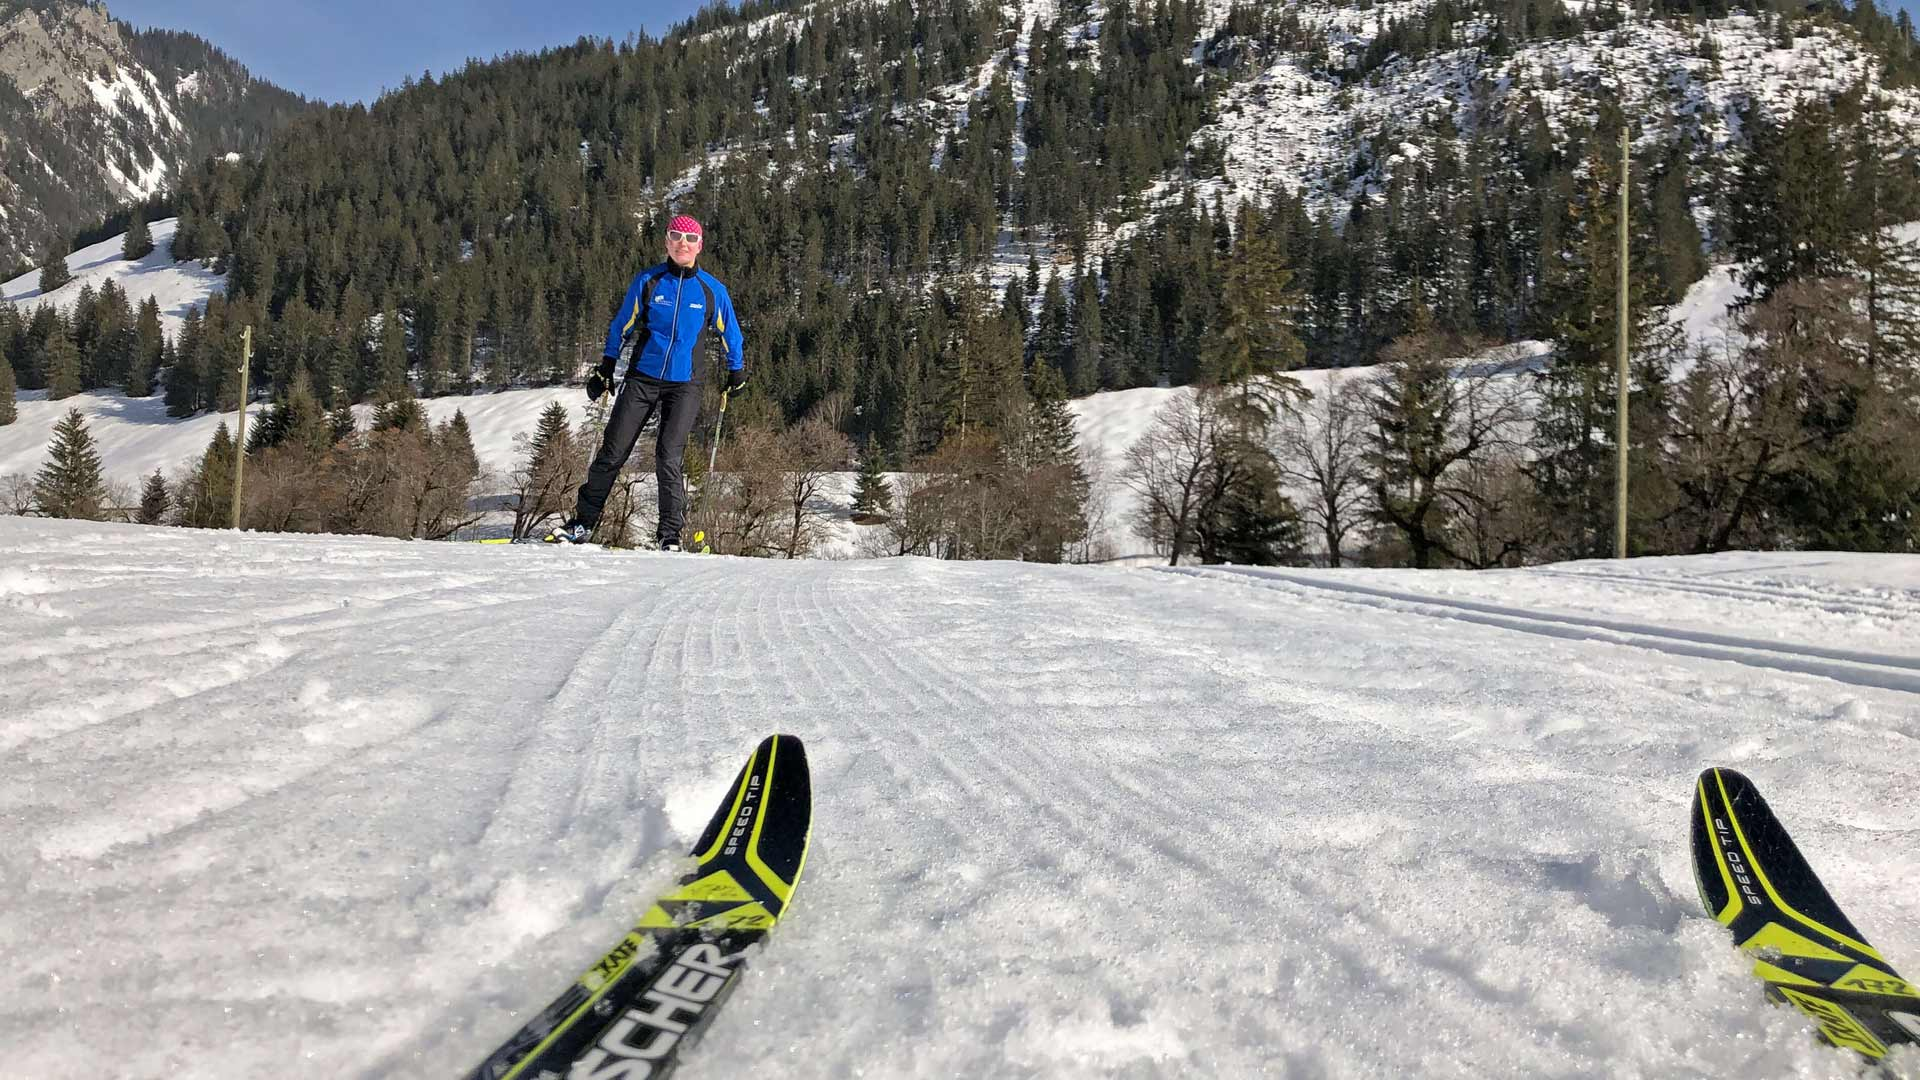 naturpark-diemtigtal-langlaufskis-langlaeufer